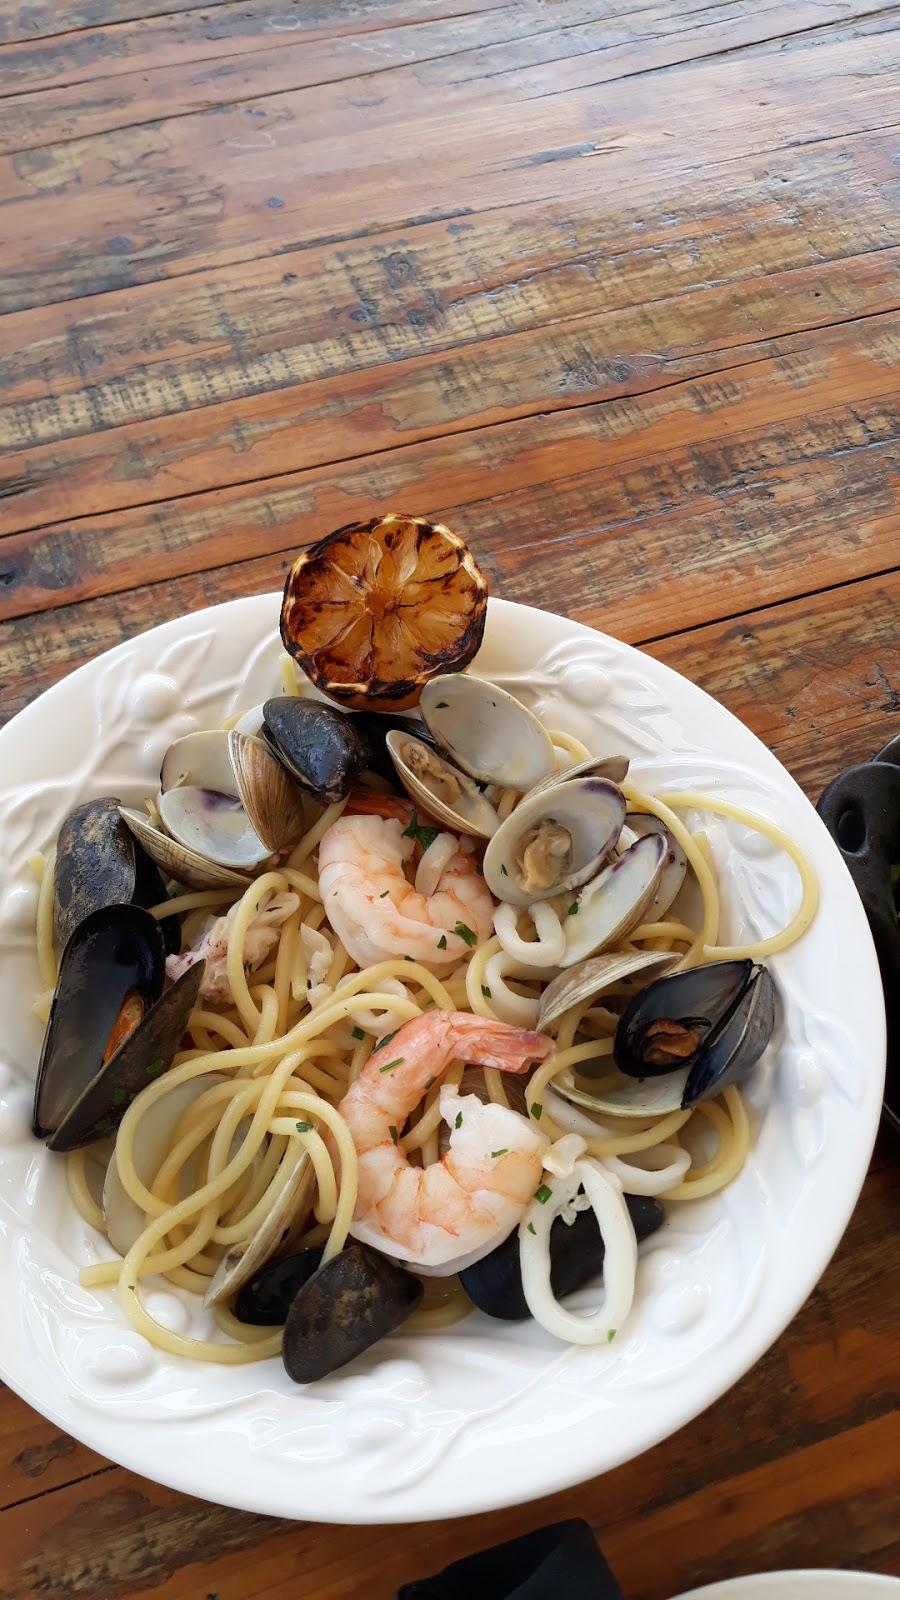 VITA Italian Bar & Grill - restaurant  | Photo 9 of 10 | Address: 3101 W Temple Ave, Pomona, CA 91768, USA | Phone: (909) 348-5900